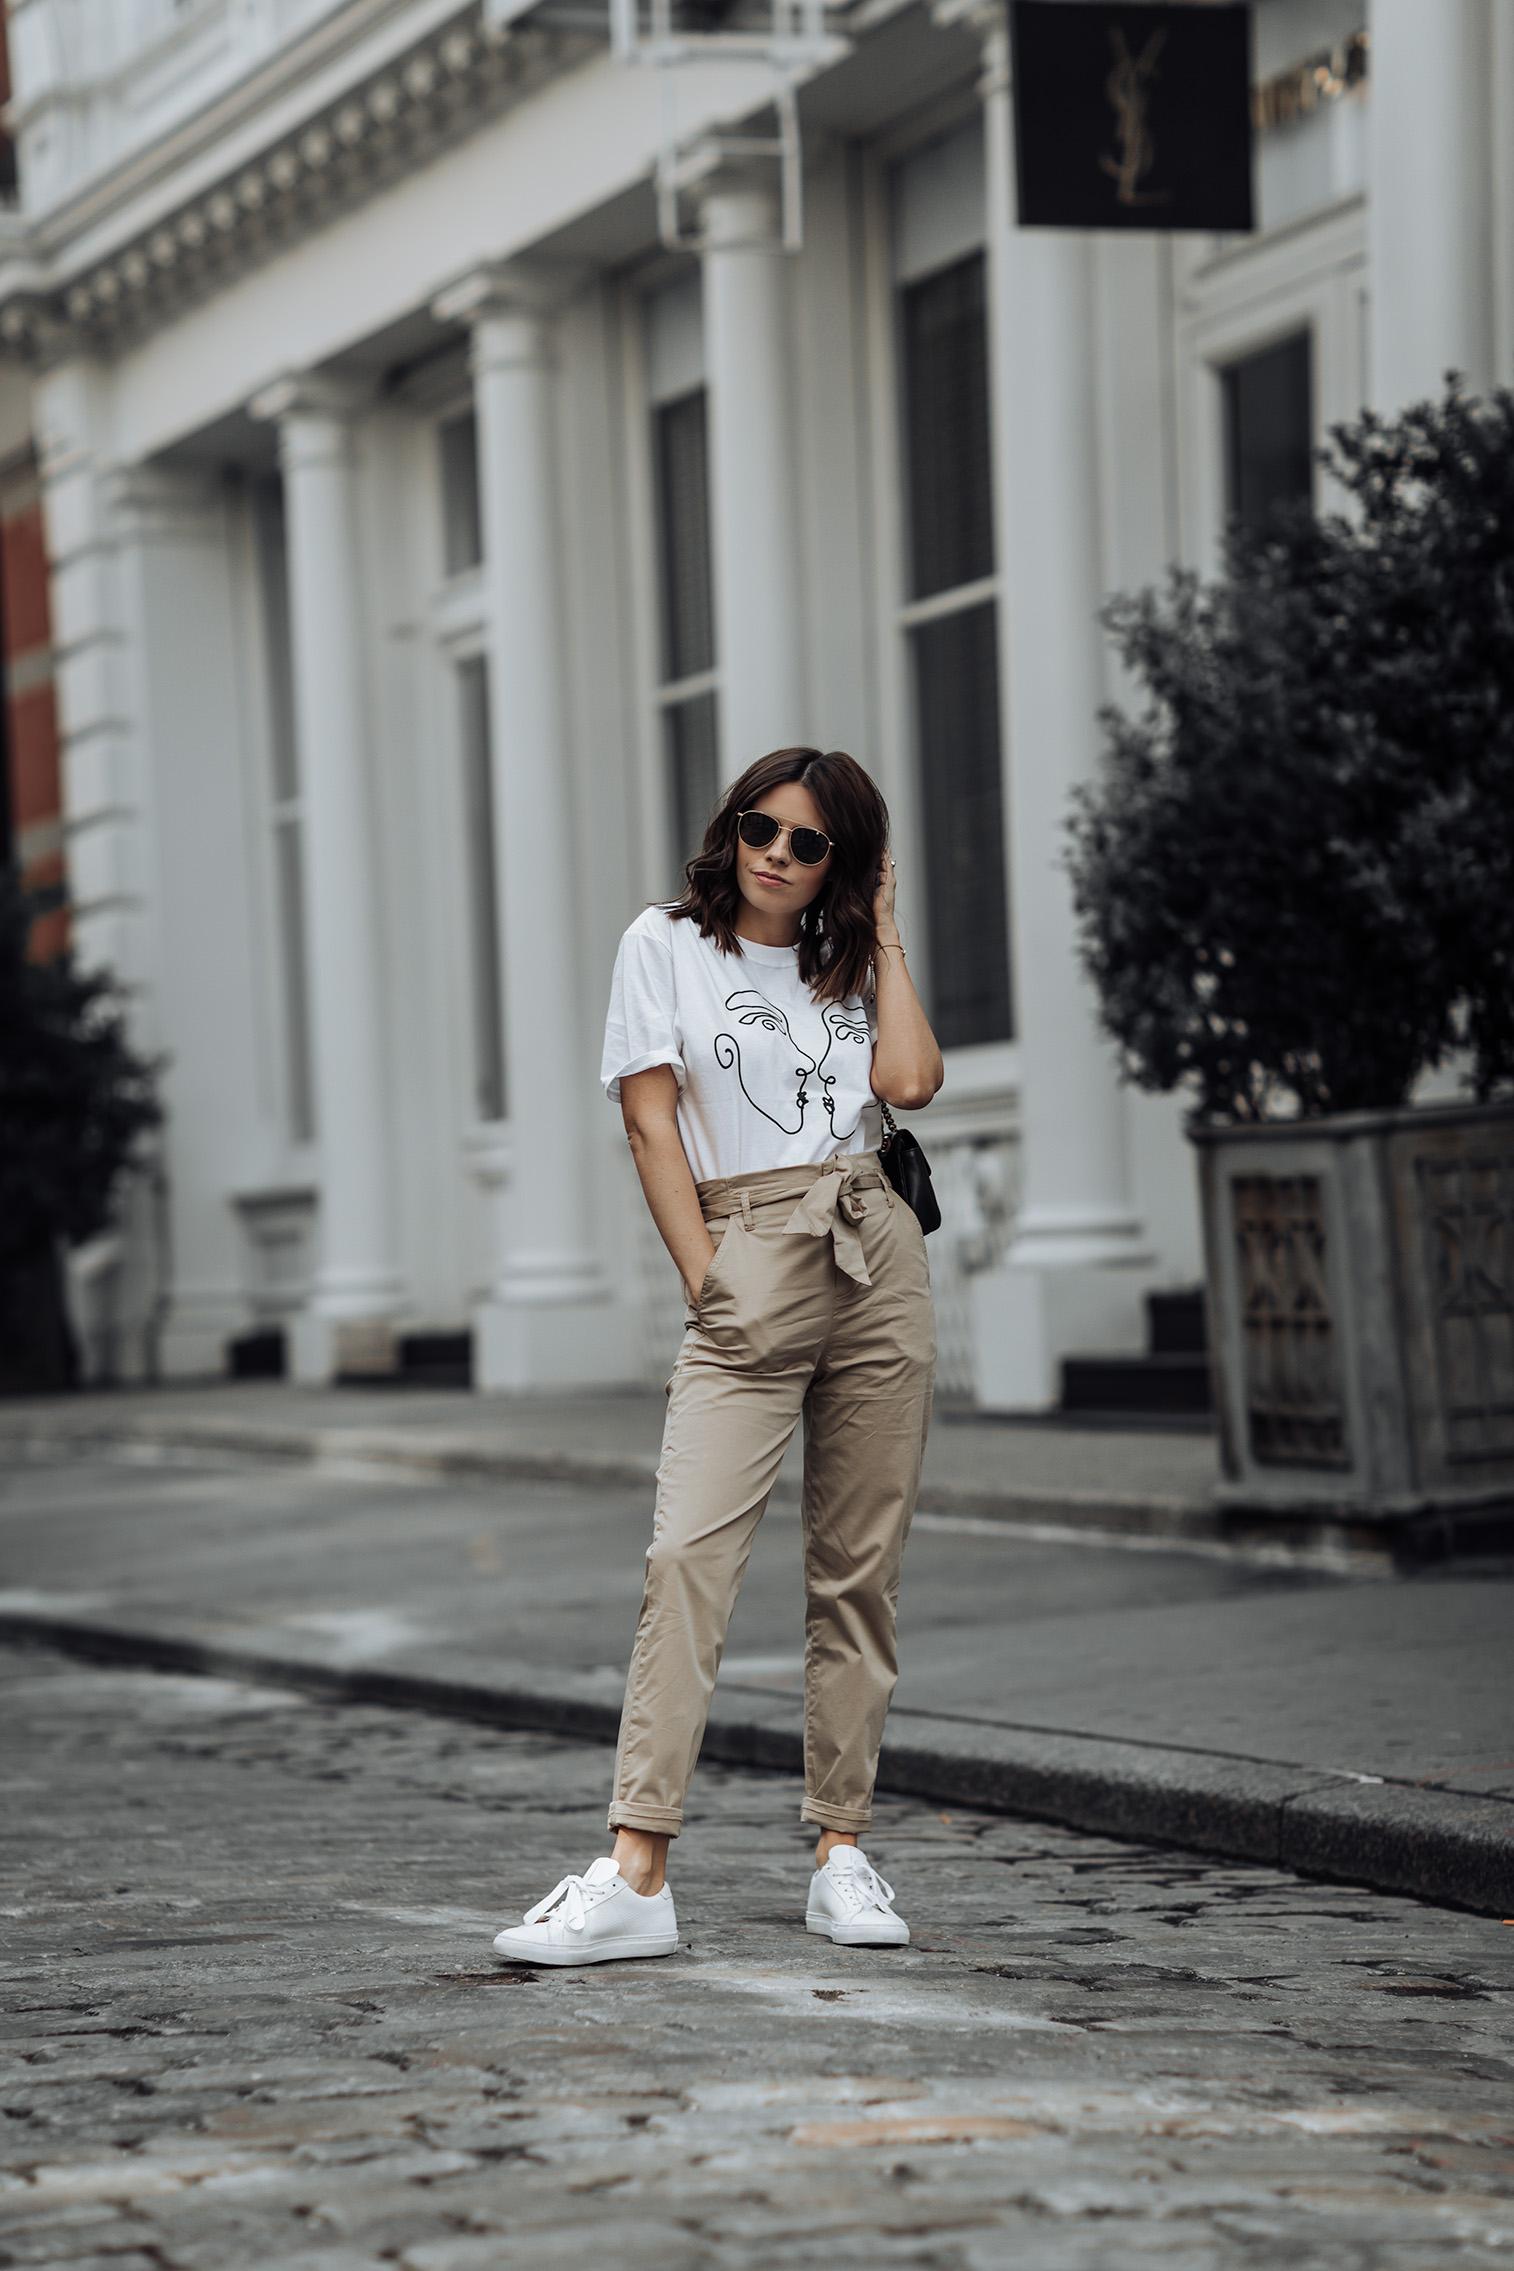 Stradivarious Plain Tie Waist Pants | ASOS Graphic Tee | Greats Brand Sneakers | Gucci Bag #streetstyle #liketkit #ASOS #paperbagpants